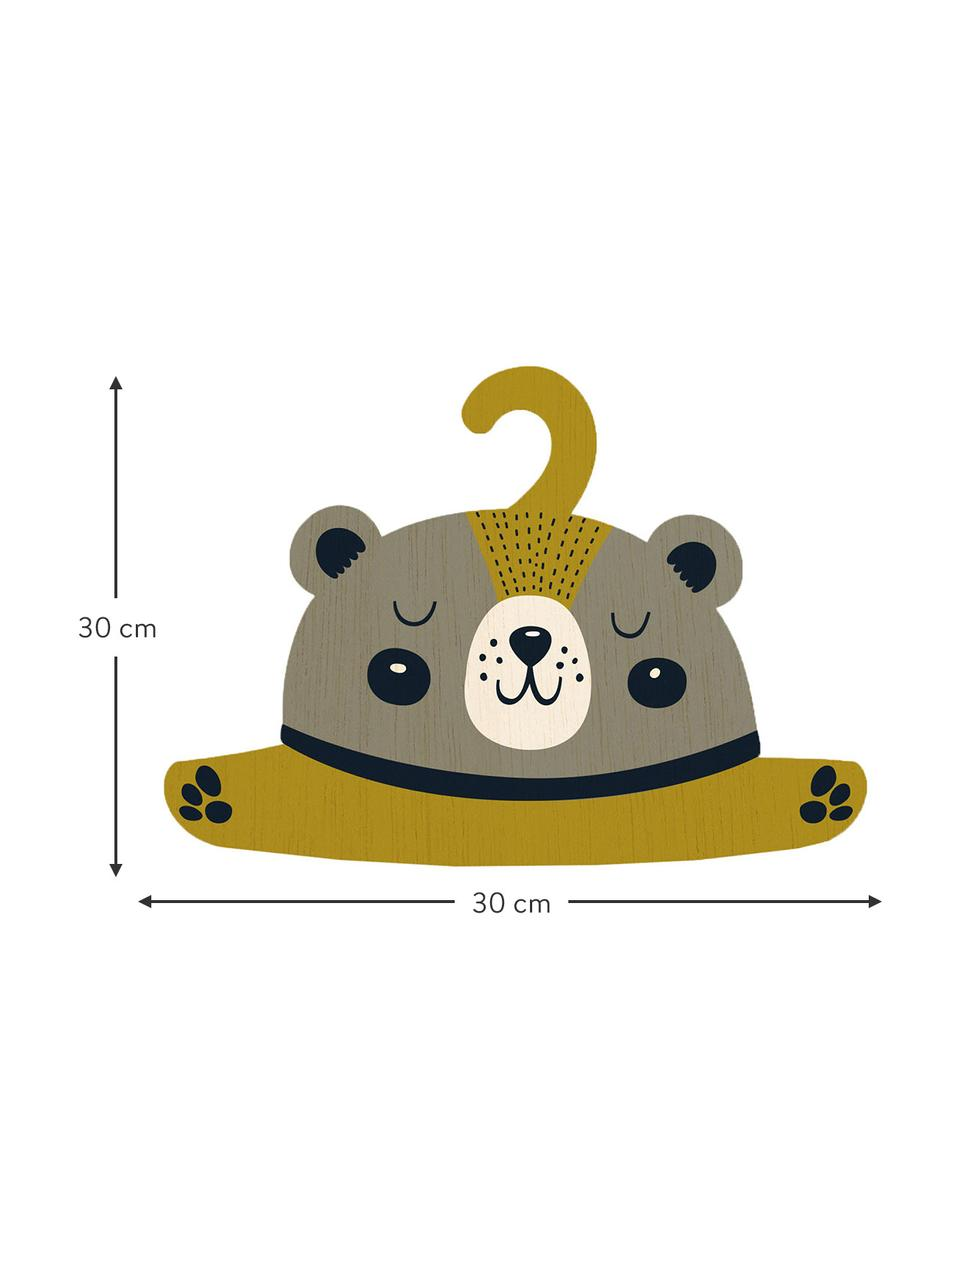 Kleiderbügel Bear, Sperrholz, beschichtet, Greige, Senfgelb, Schwarz, Creme, 30 x 30 cm